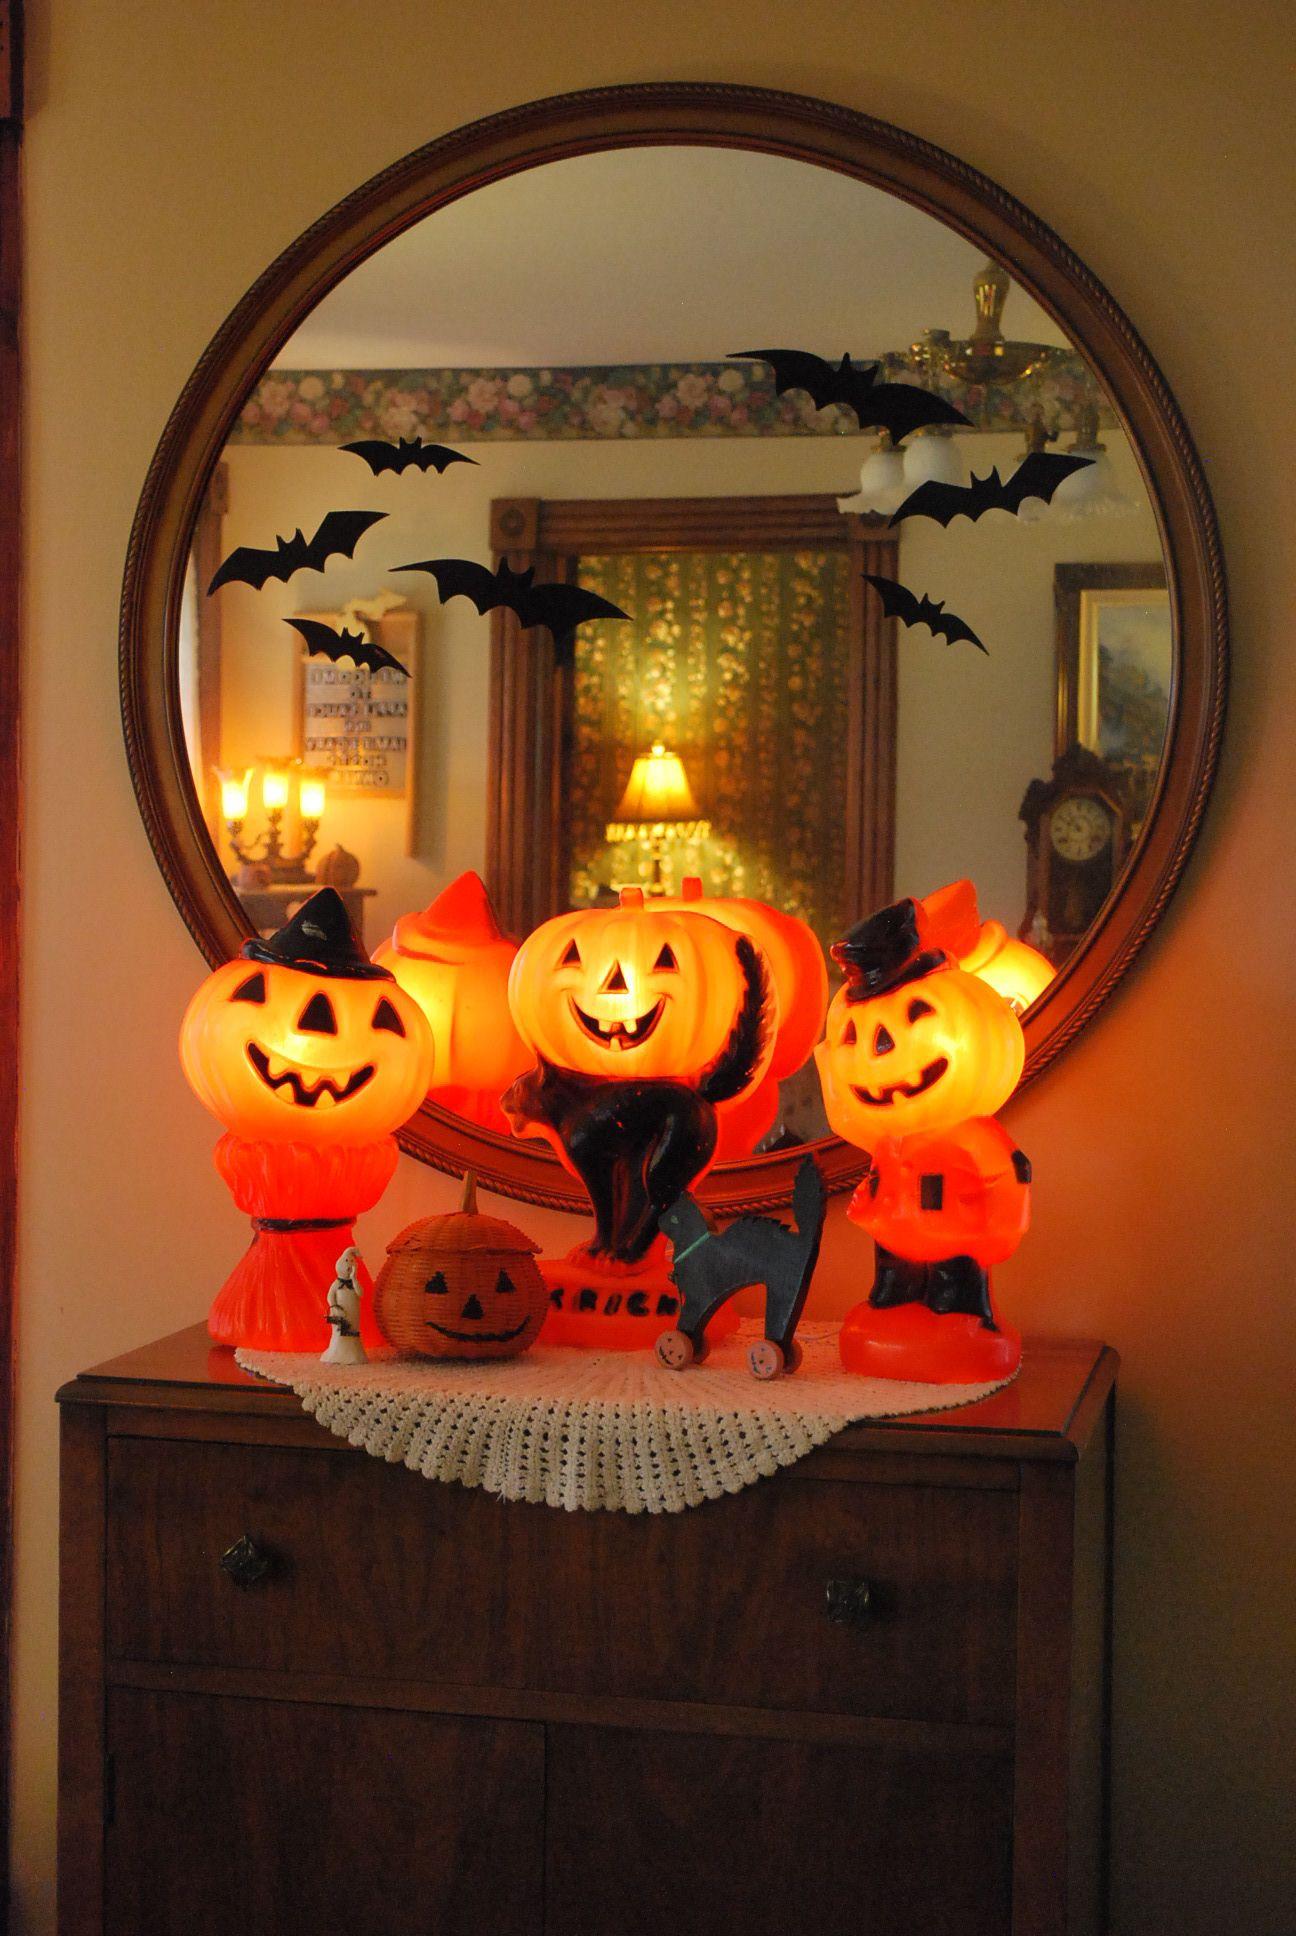 Vintage halloween decorations plastic - My Vintage Lighted Plastic Pumpkin Collection Halloween Decorations